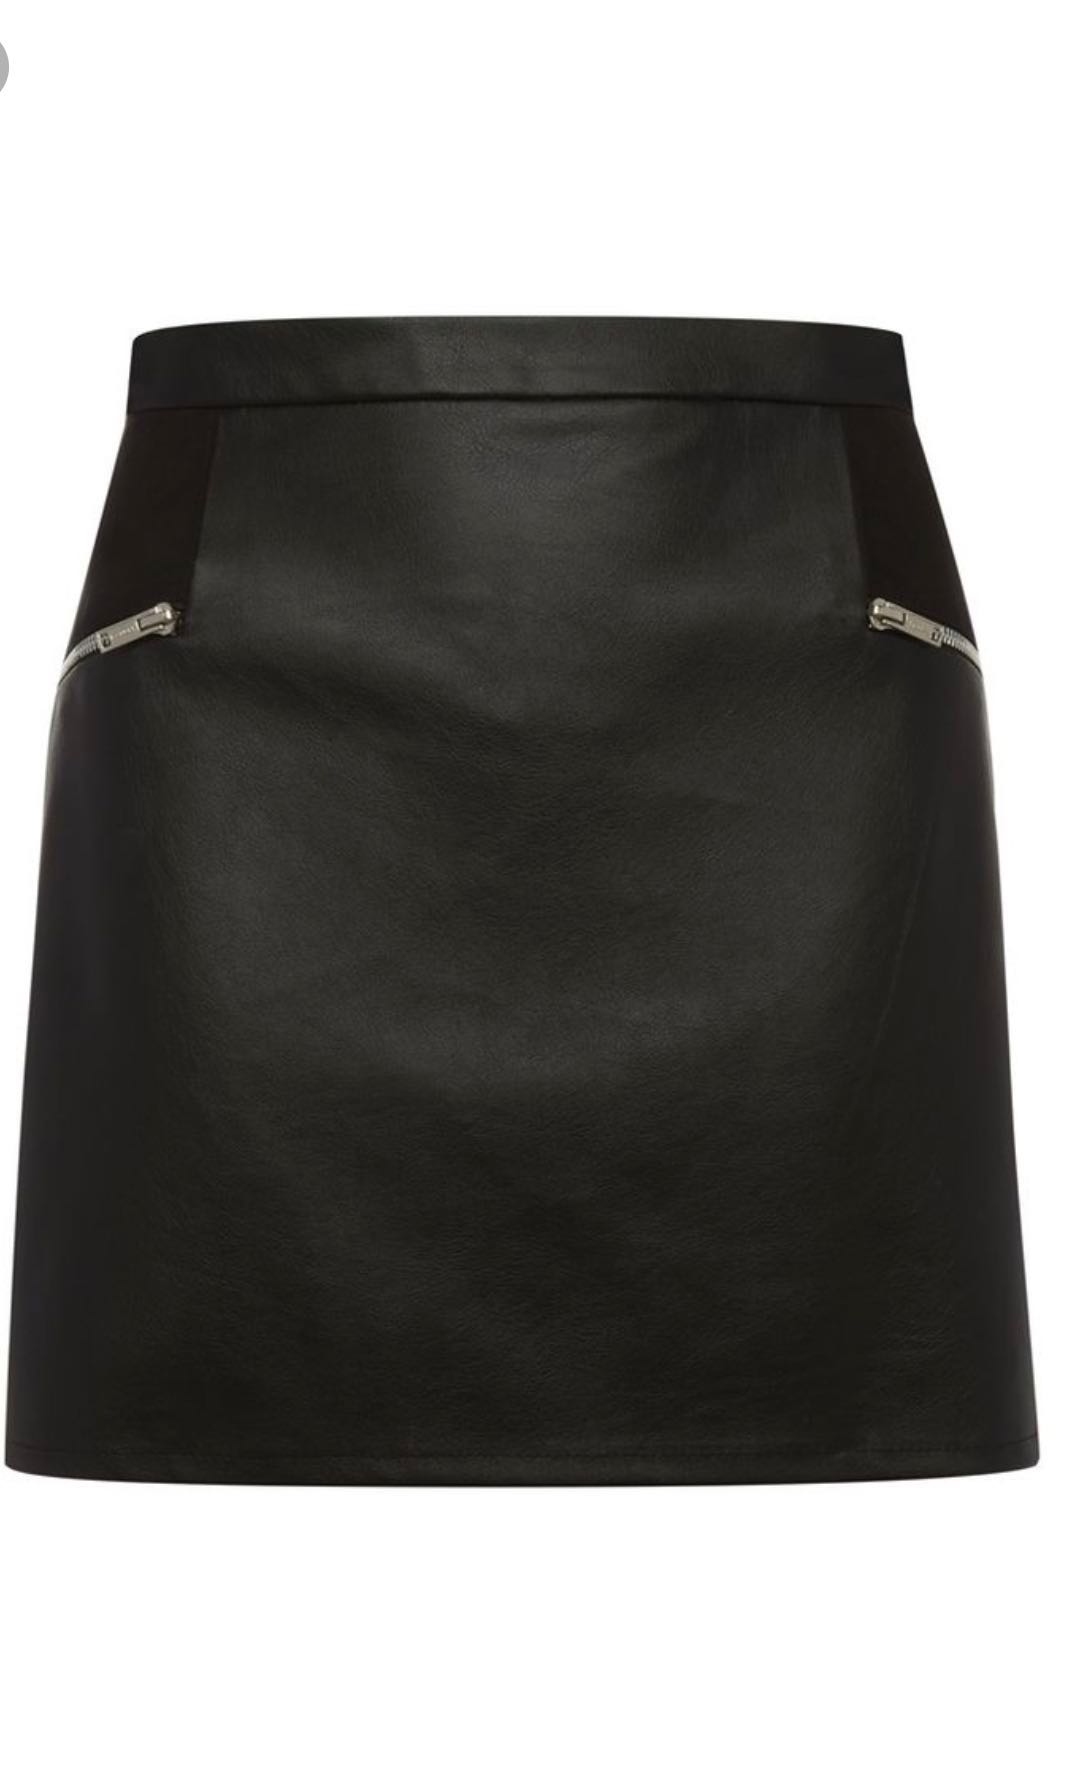 76f61d4fb Black Faux Leather Skirt PRIMARK #Fashion100, Women's Fashion ...